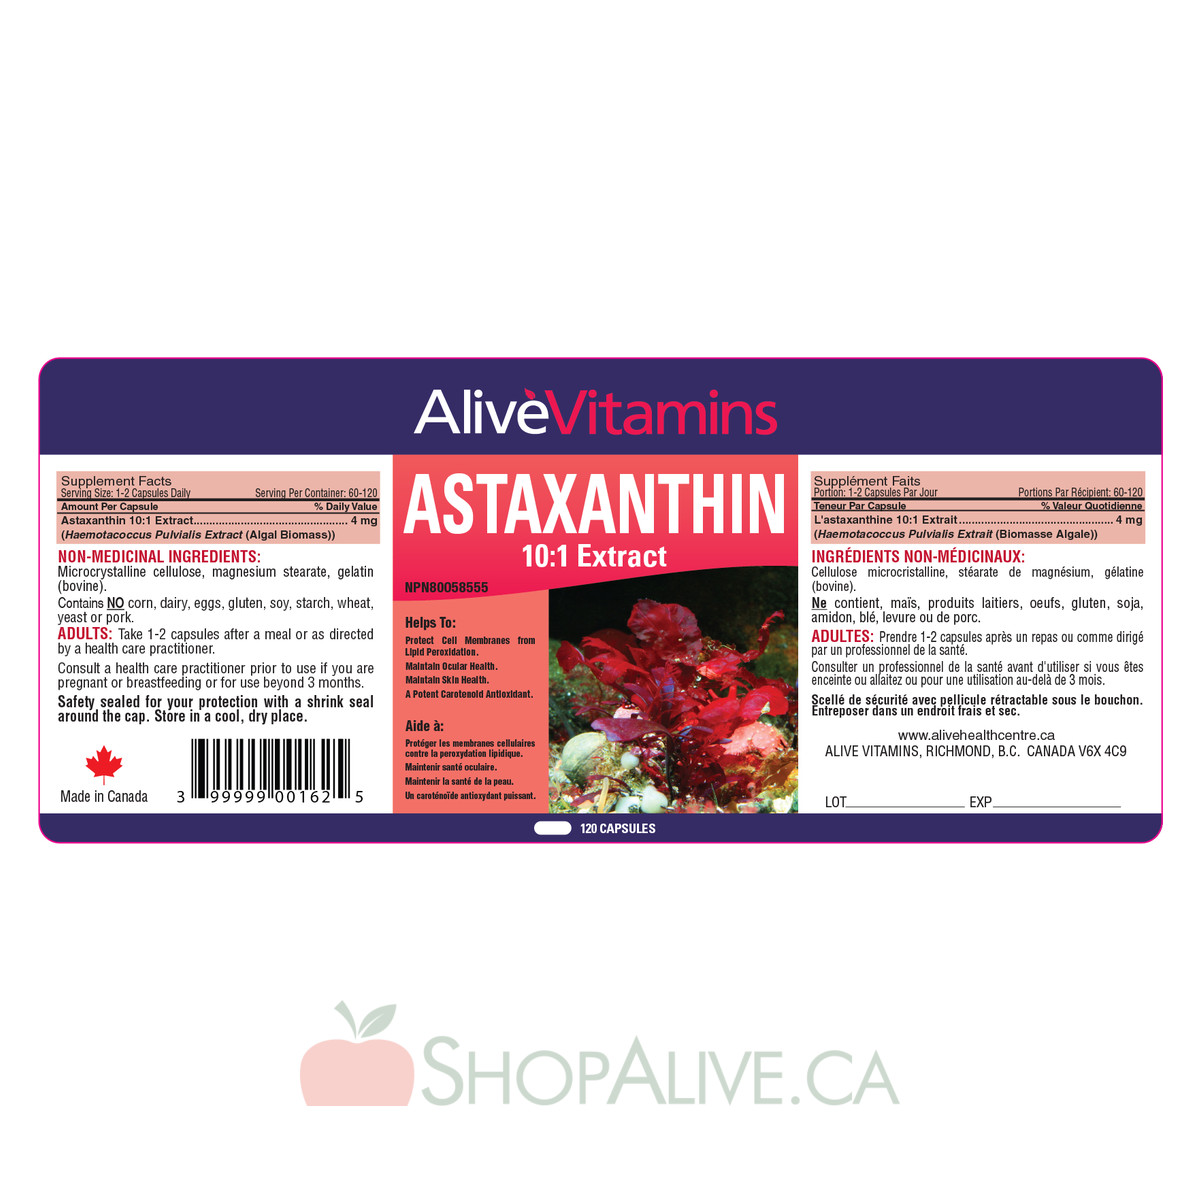 Astaxanthin 10:1 Extract - 4 mg